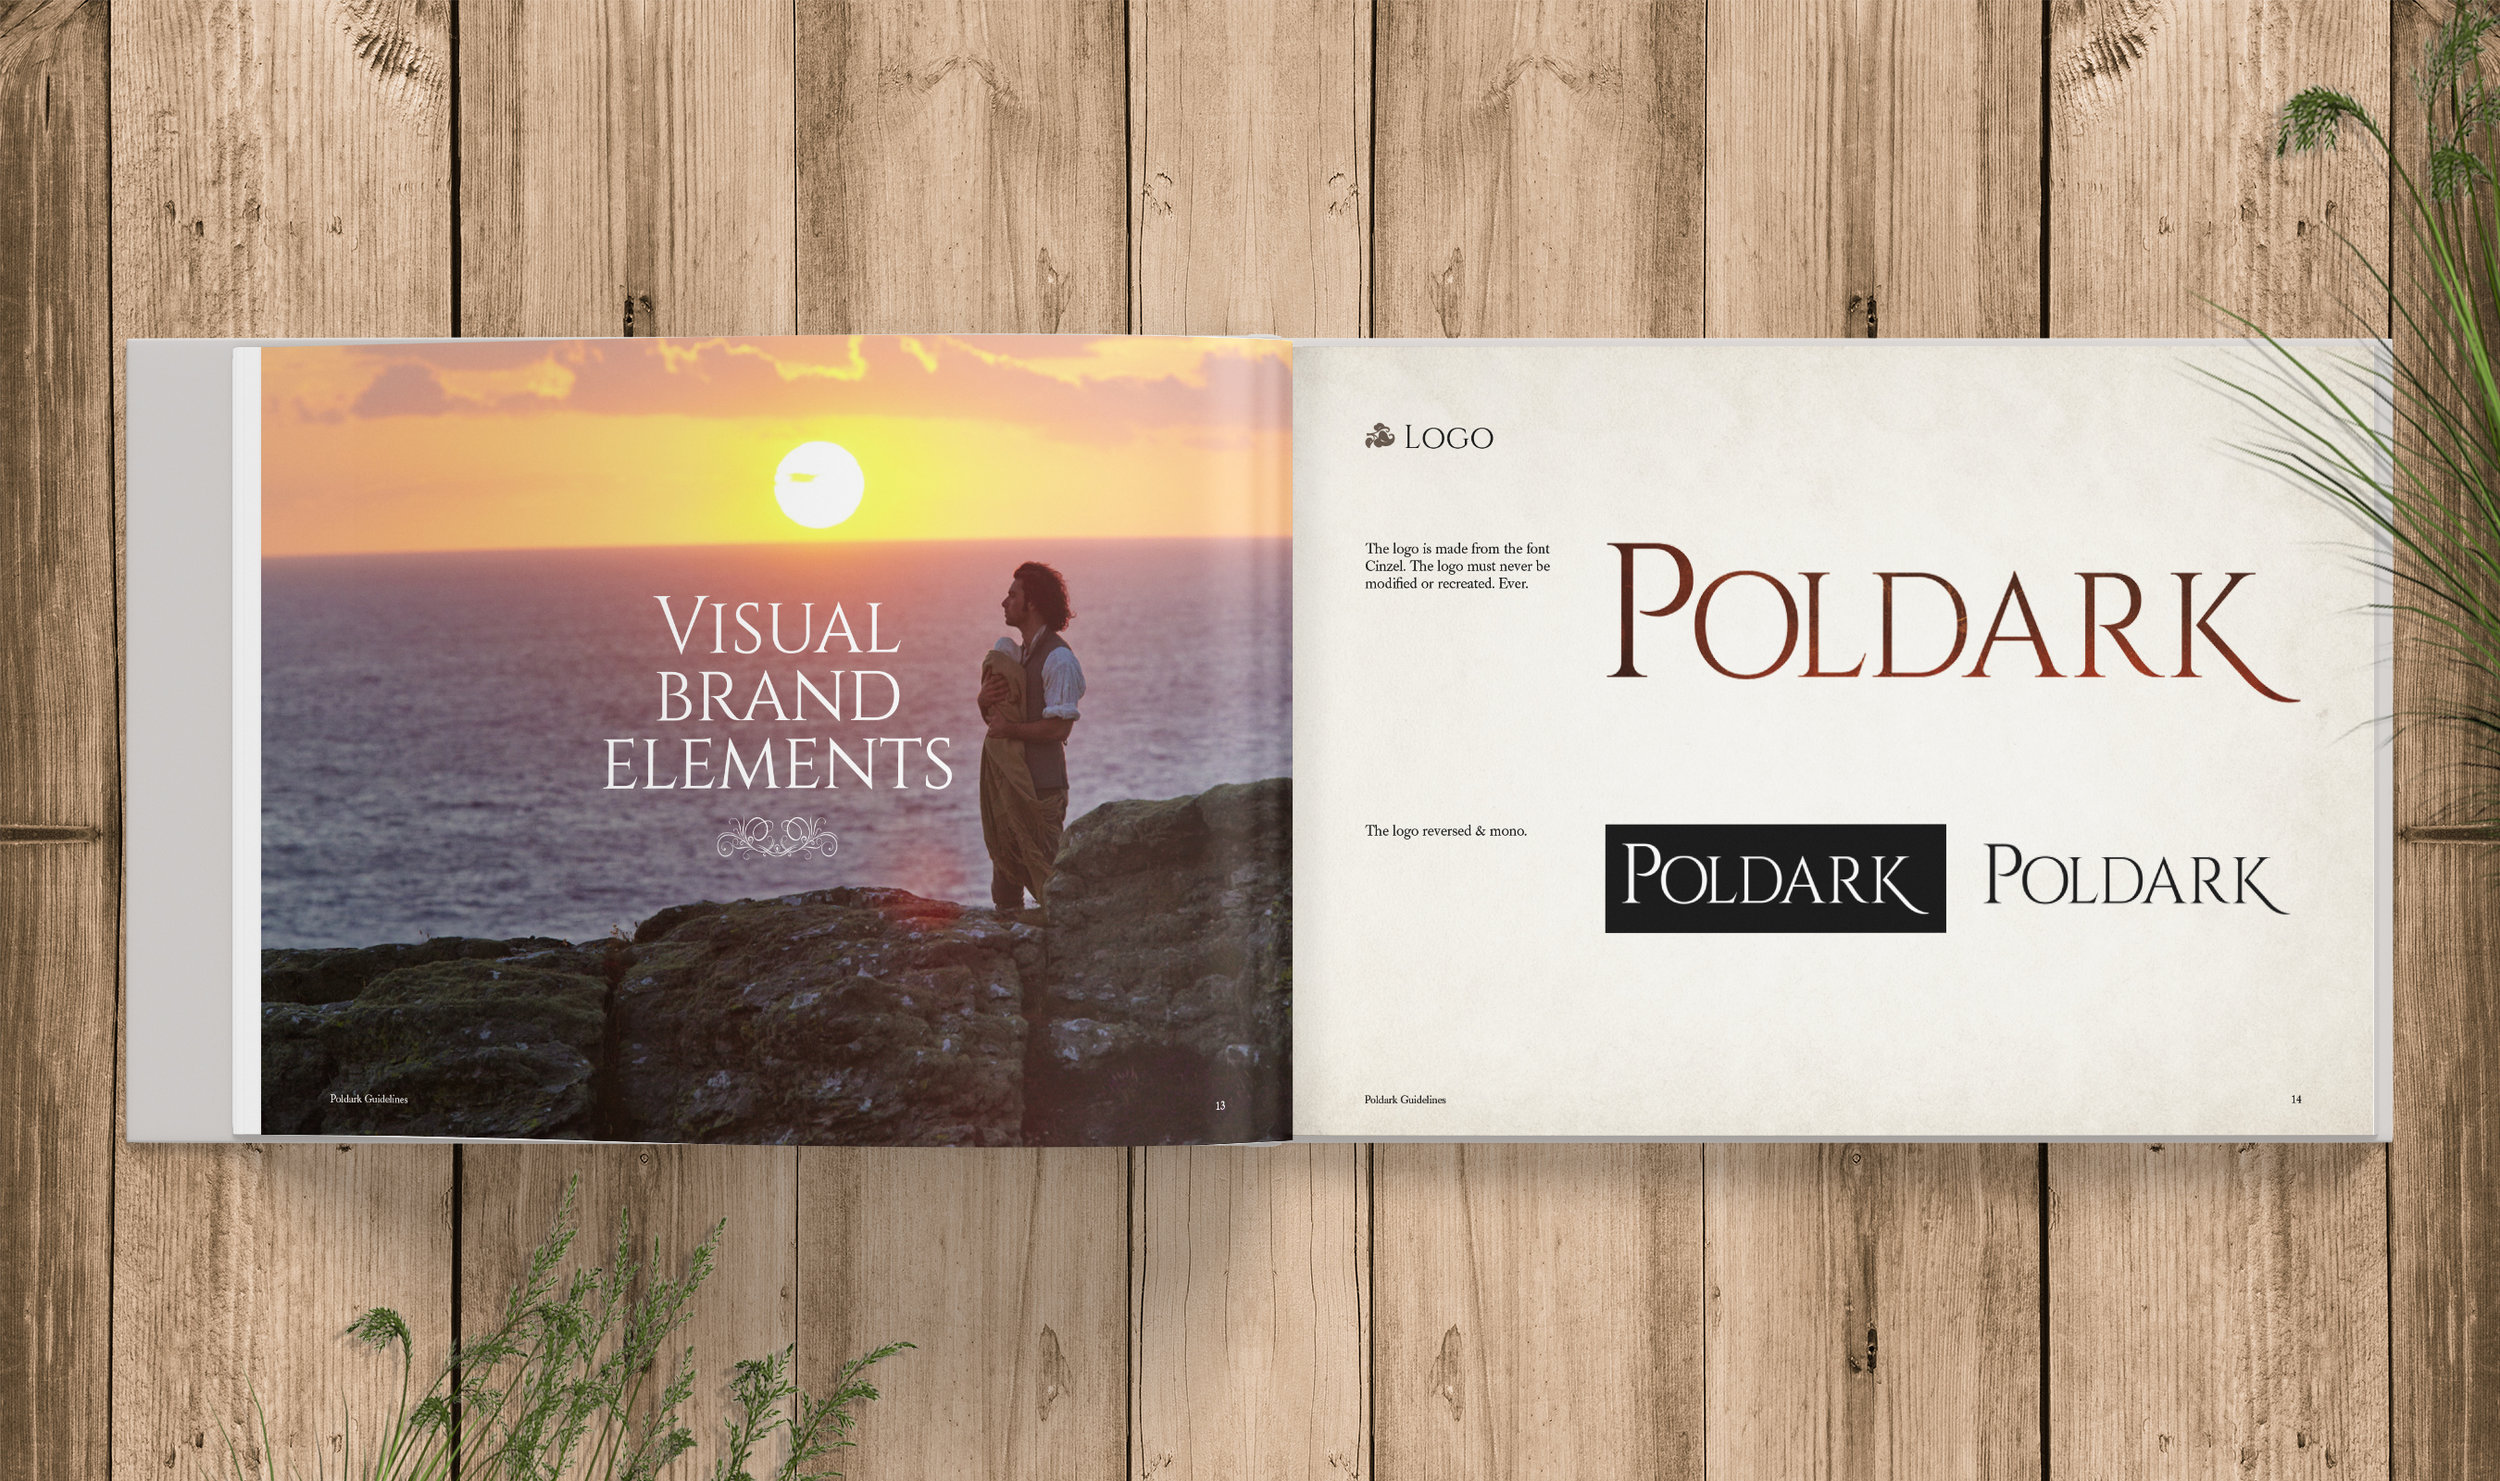 poldark_spreads 3.jpg